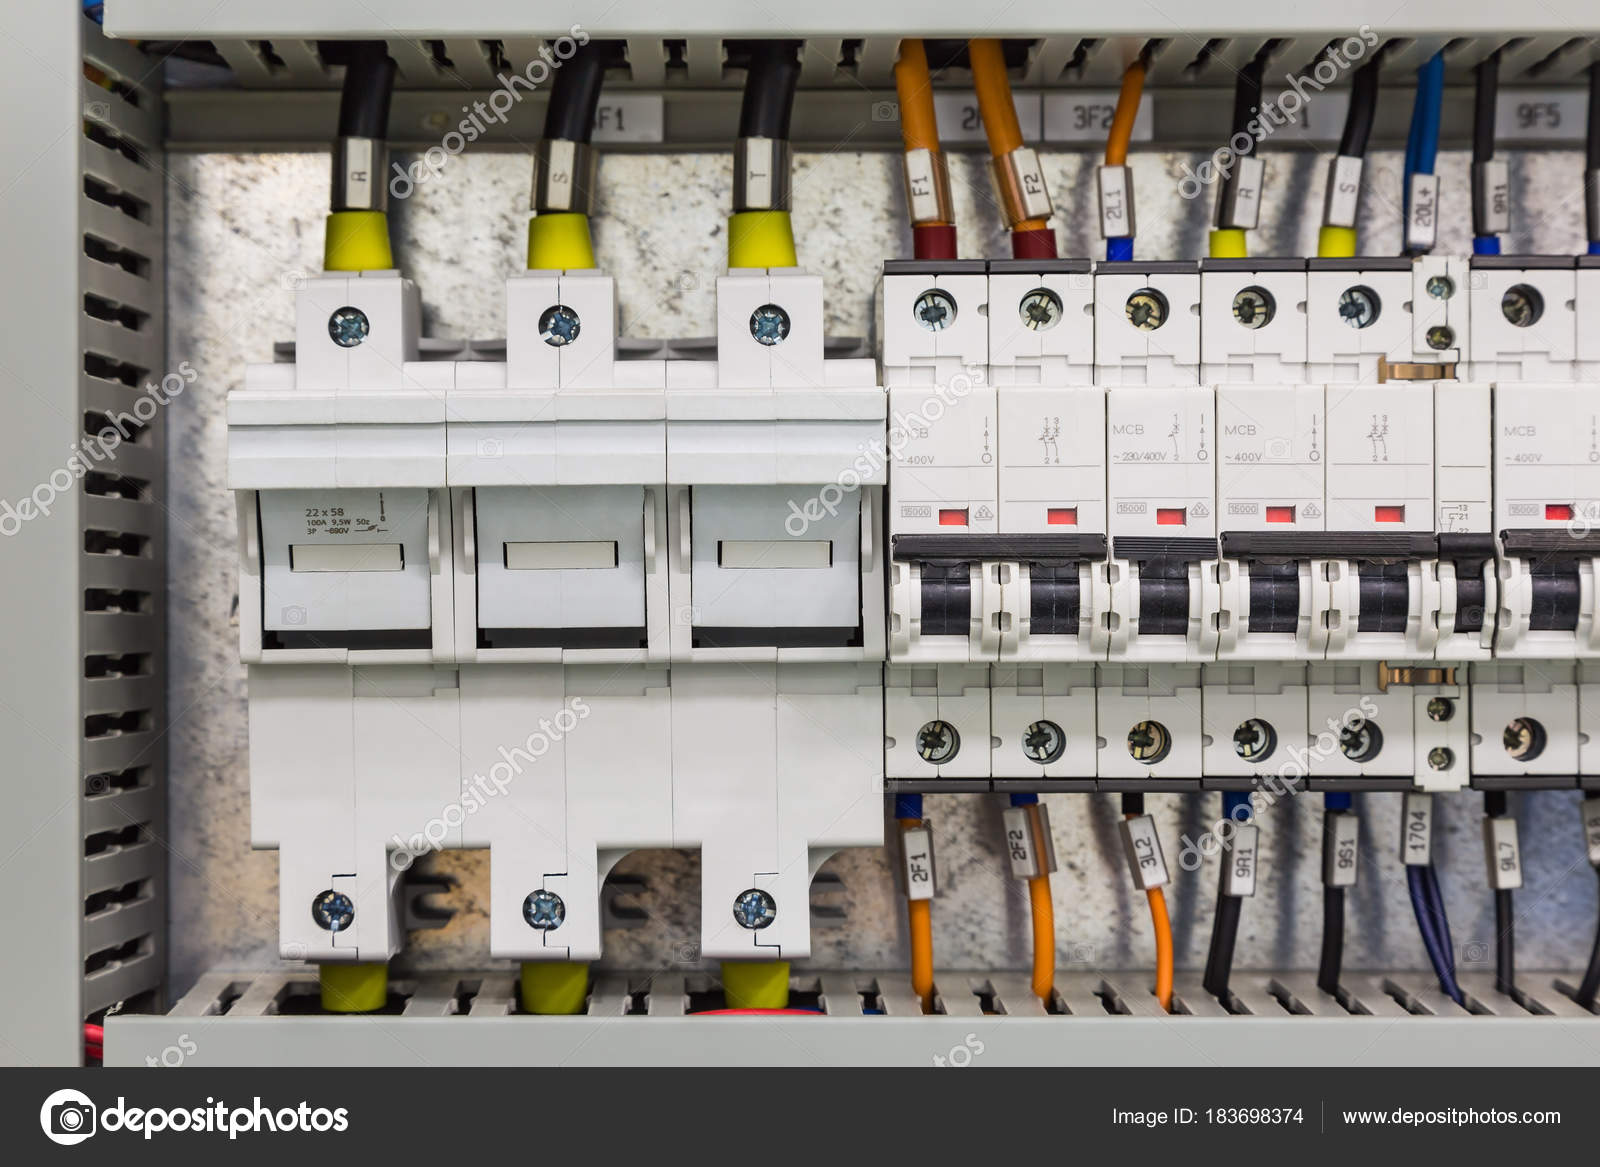 Elektrische Geräte — Stockfoto © teptong #183698374